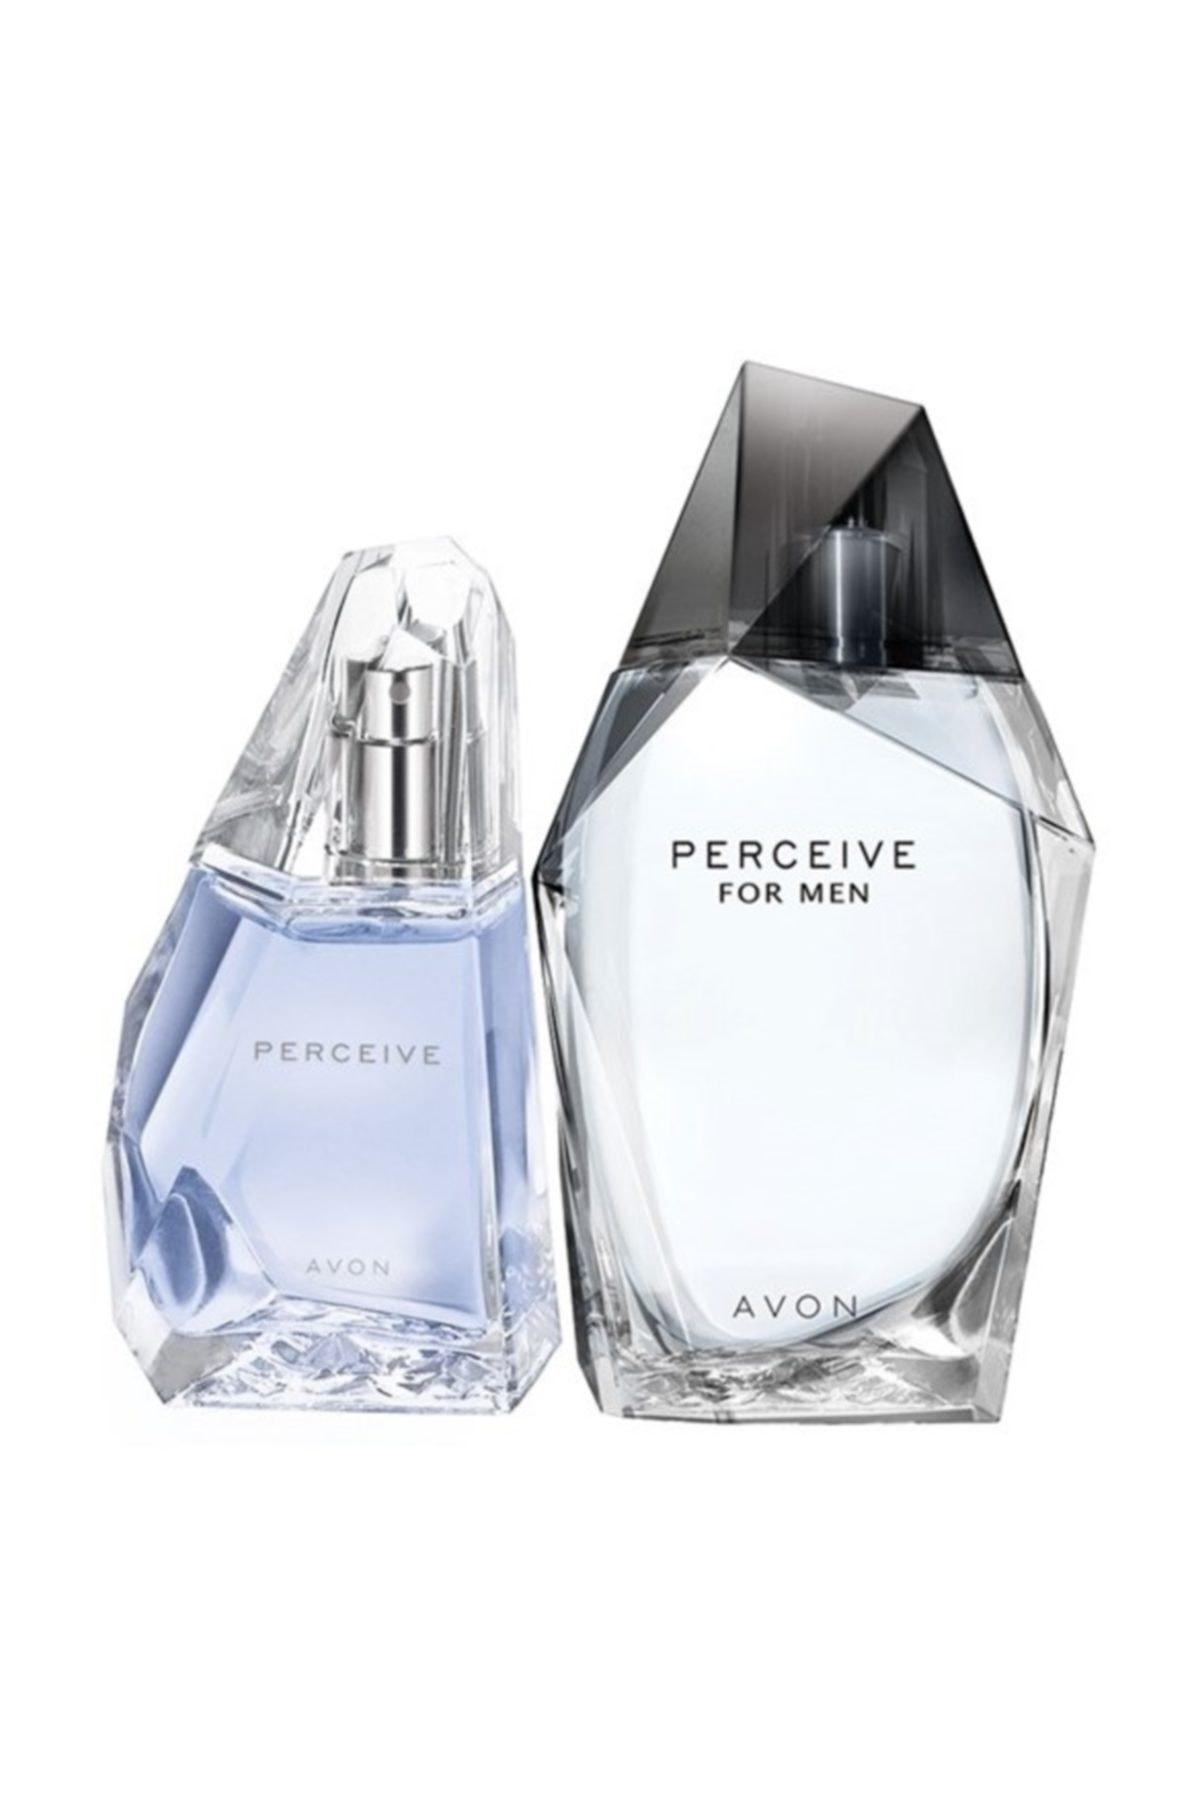 Perceive Edp 50 ml Kadın Parfümü + Perceive Edt 100 ml Erkek Parfüm Seti 8681298981688